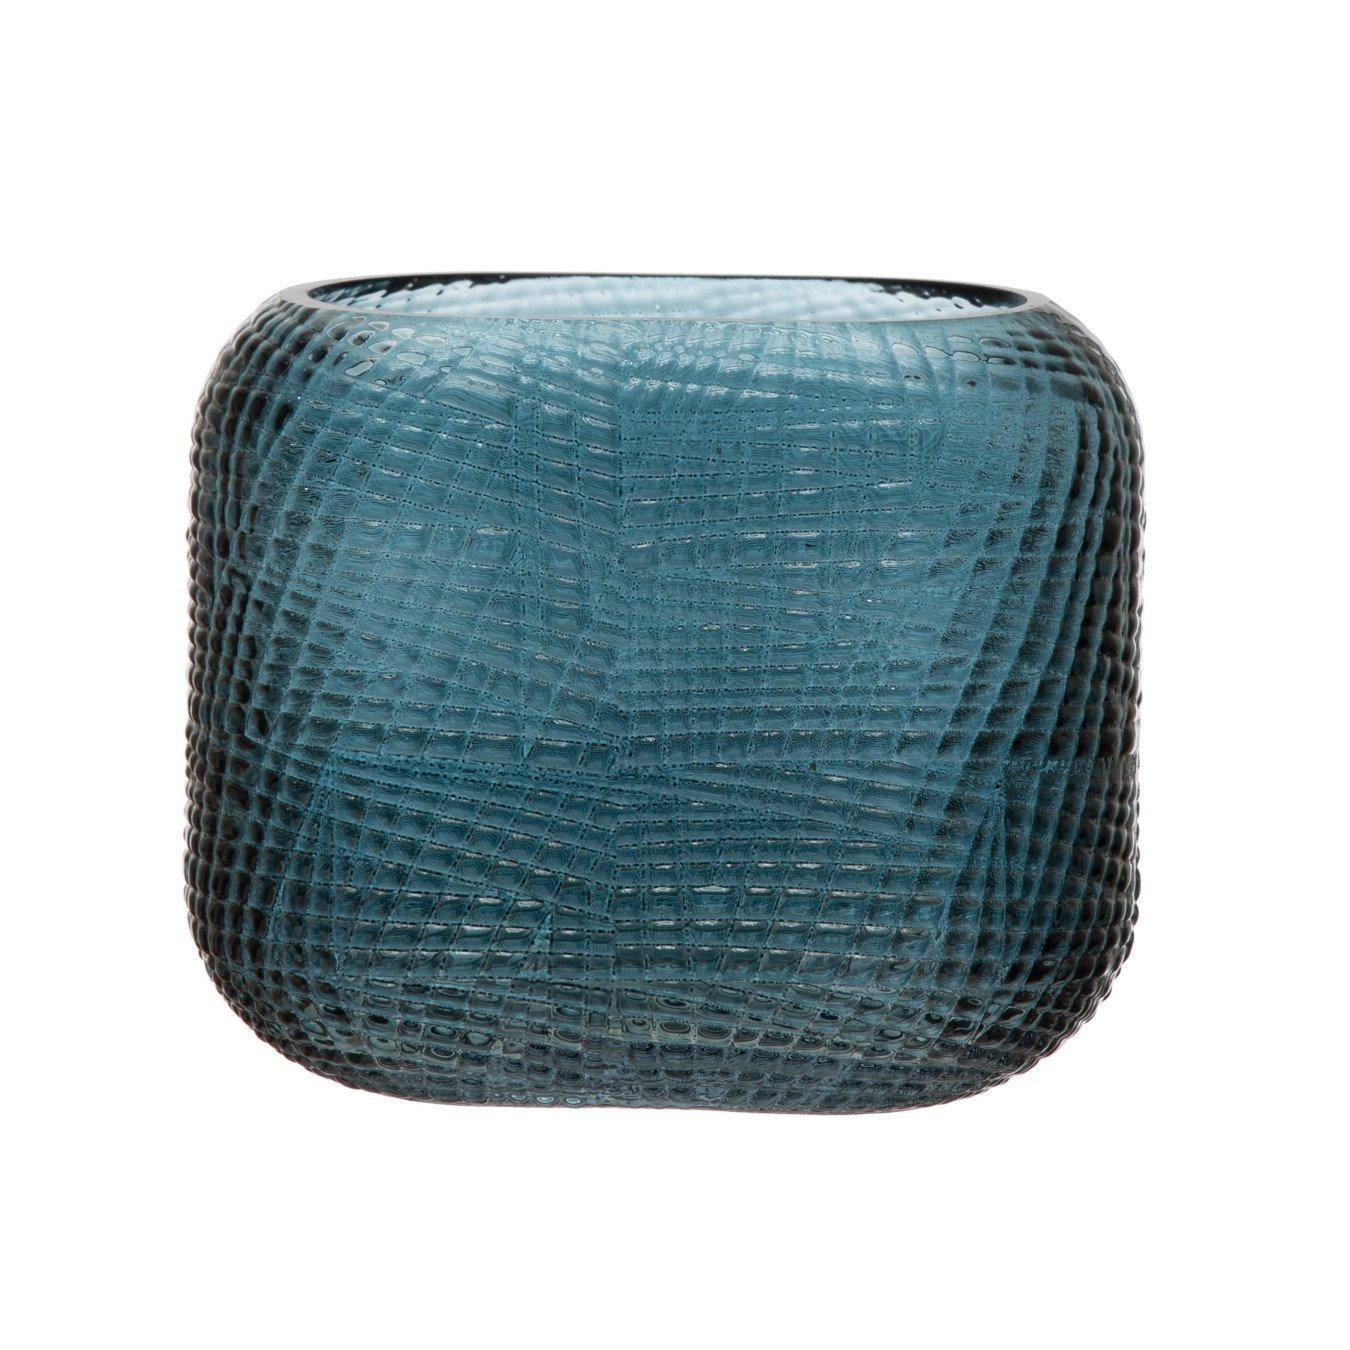 Molded Glass Rectangular Vase with Pattern, Blue